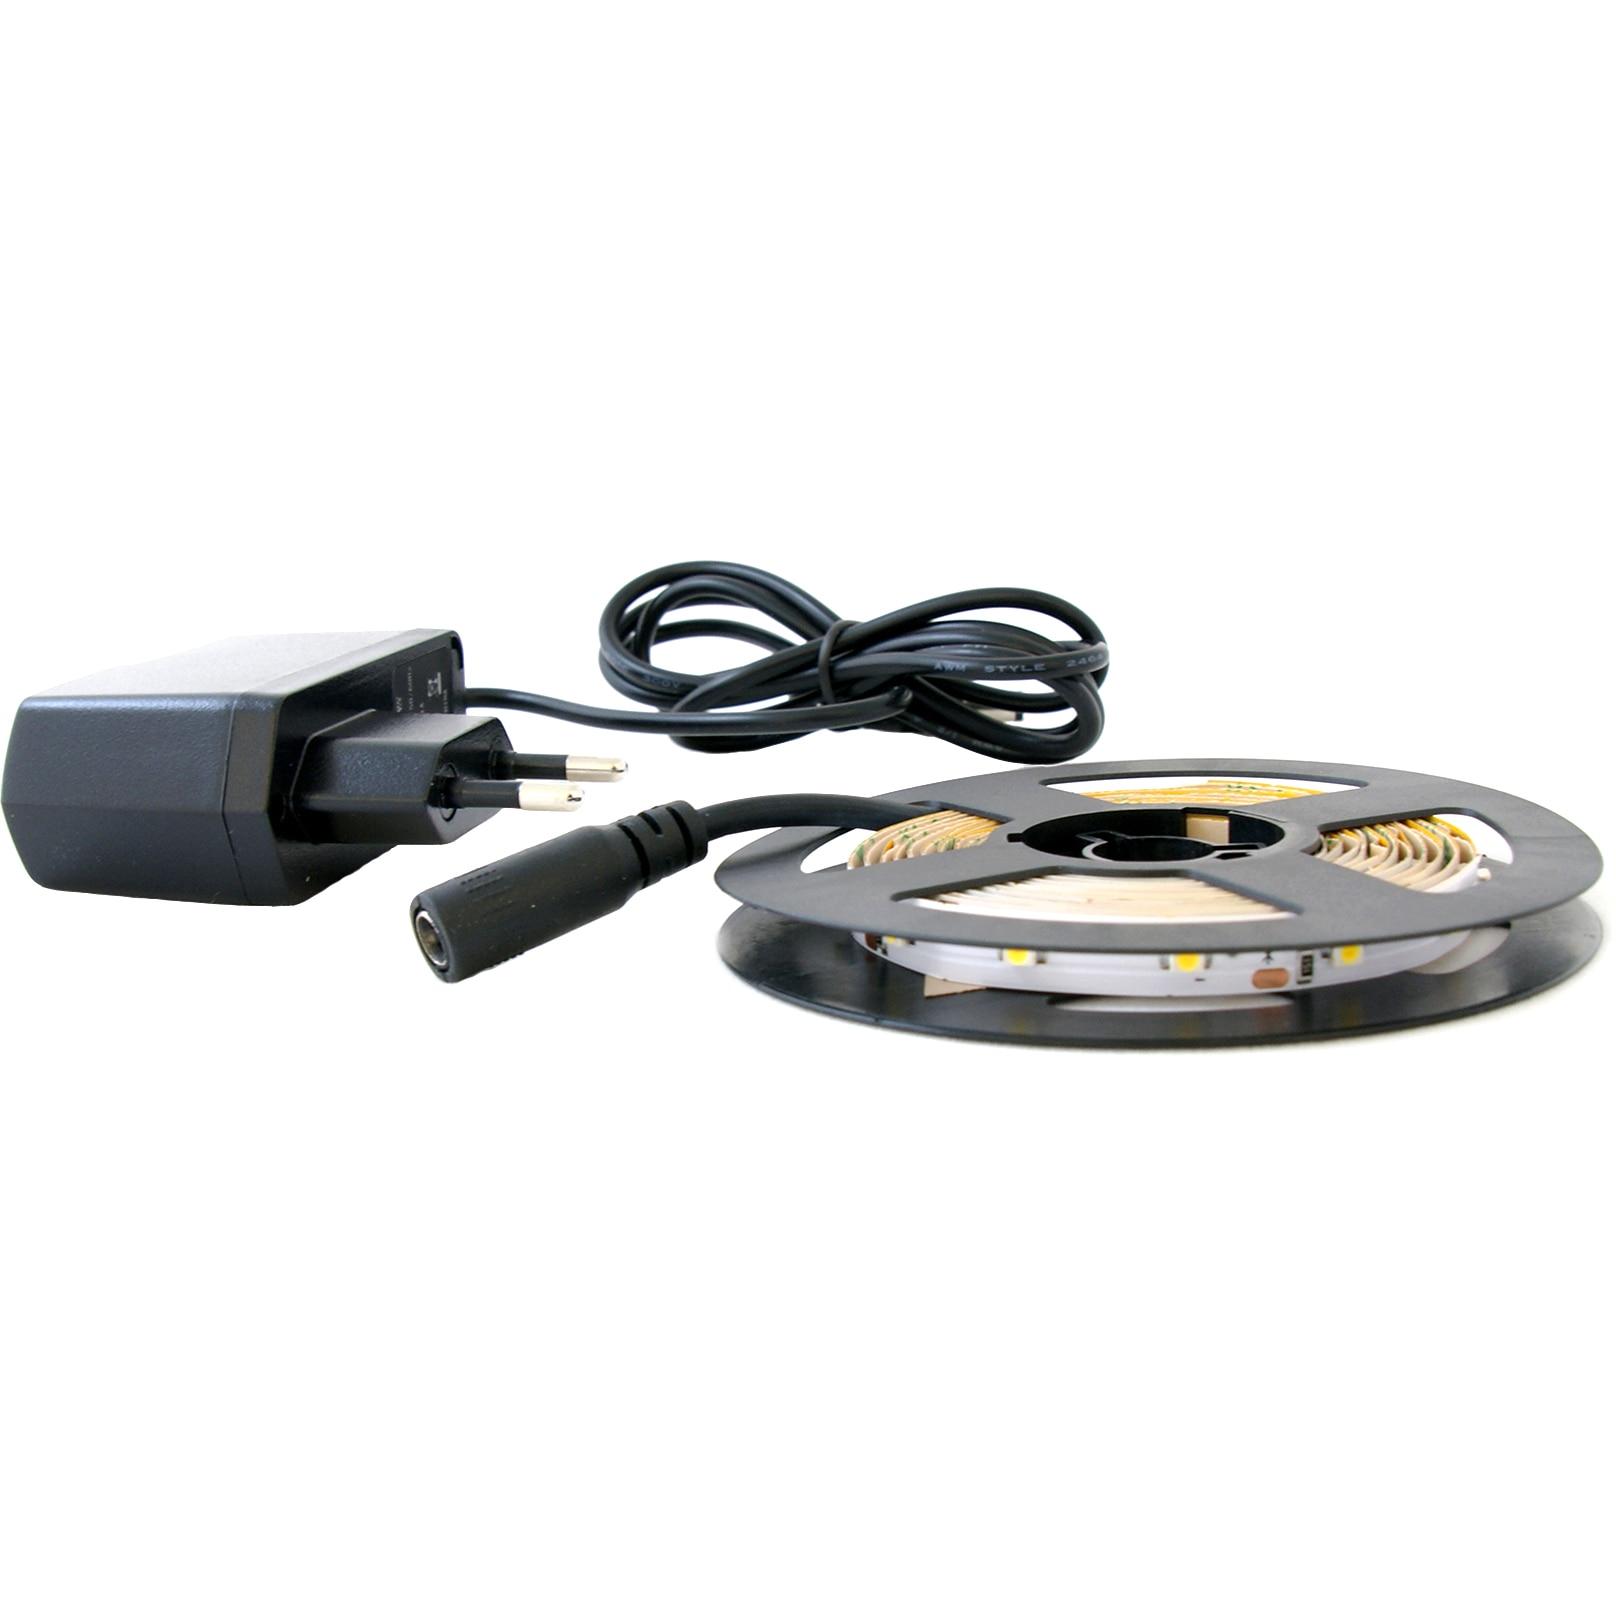 Fotografie Kit banda LED Flink, 2 m, Alb cald